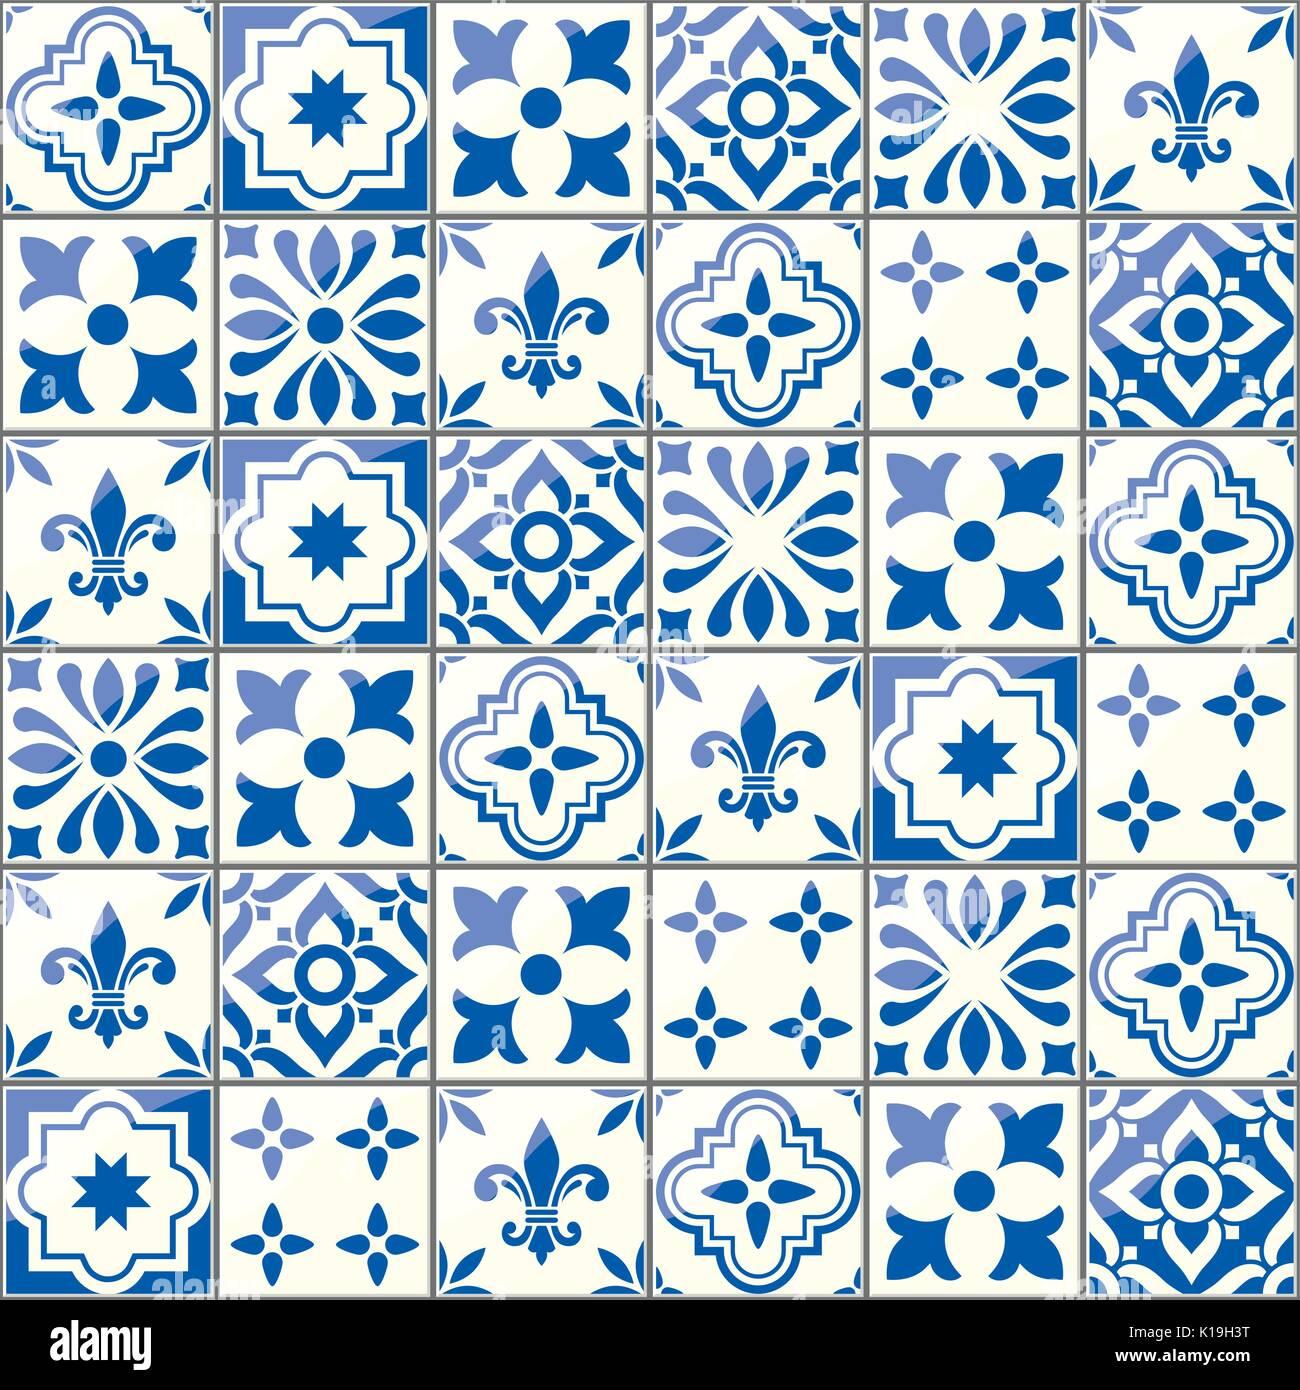 Geometric vector tiles pattern, Portuguese or Spnish seamless blue tile design, Azulejos background - Stock Vector